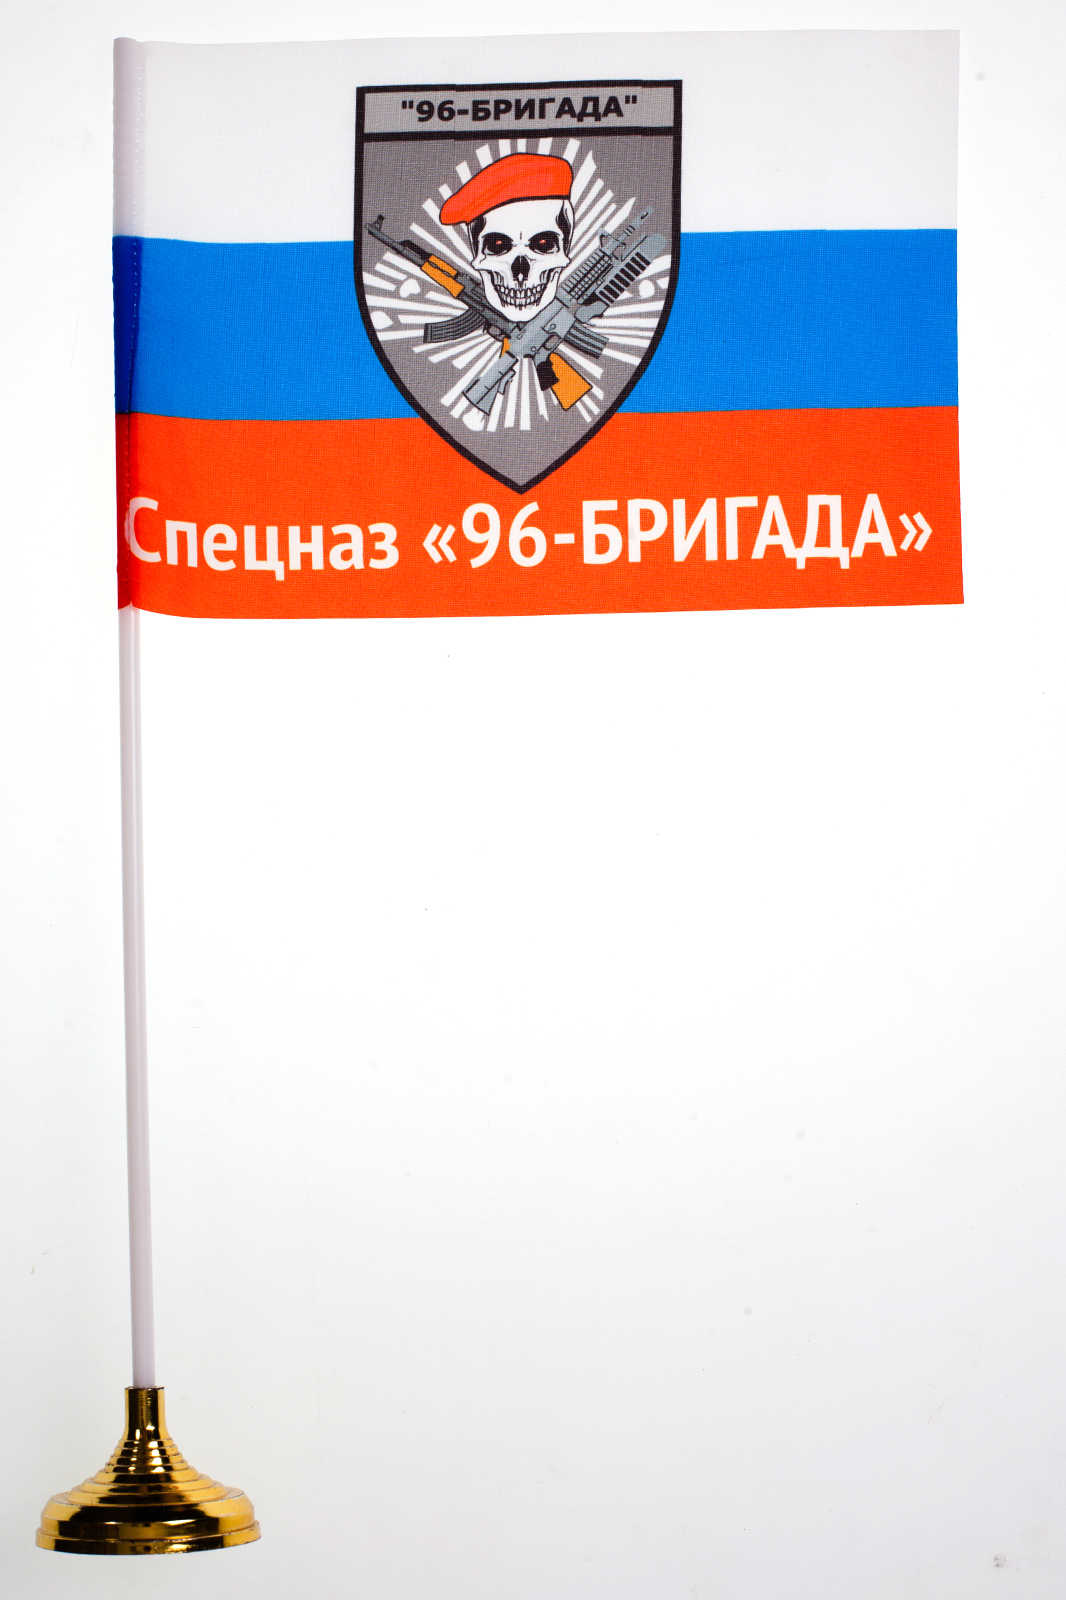 Настольный флажок Спецназ «96-БРИГАДА»